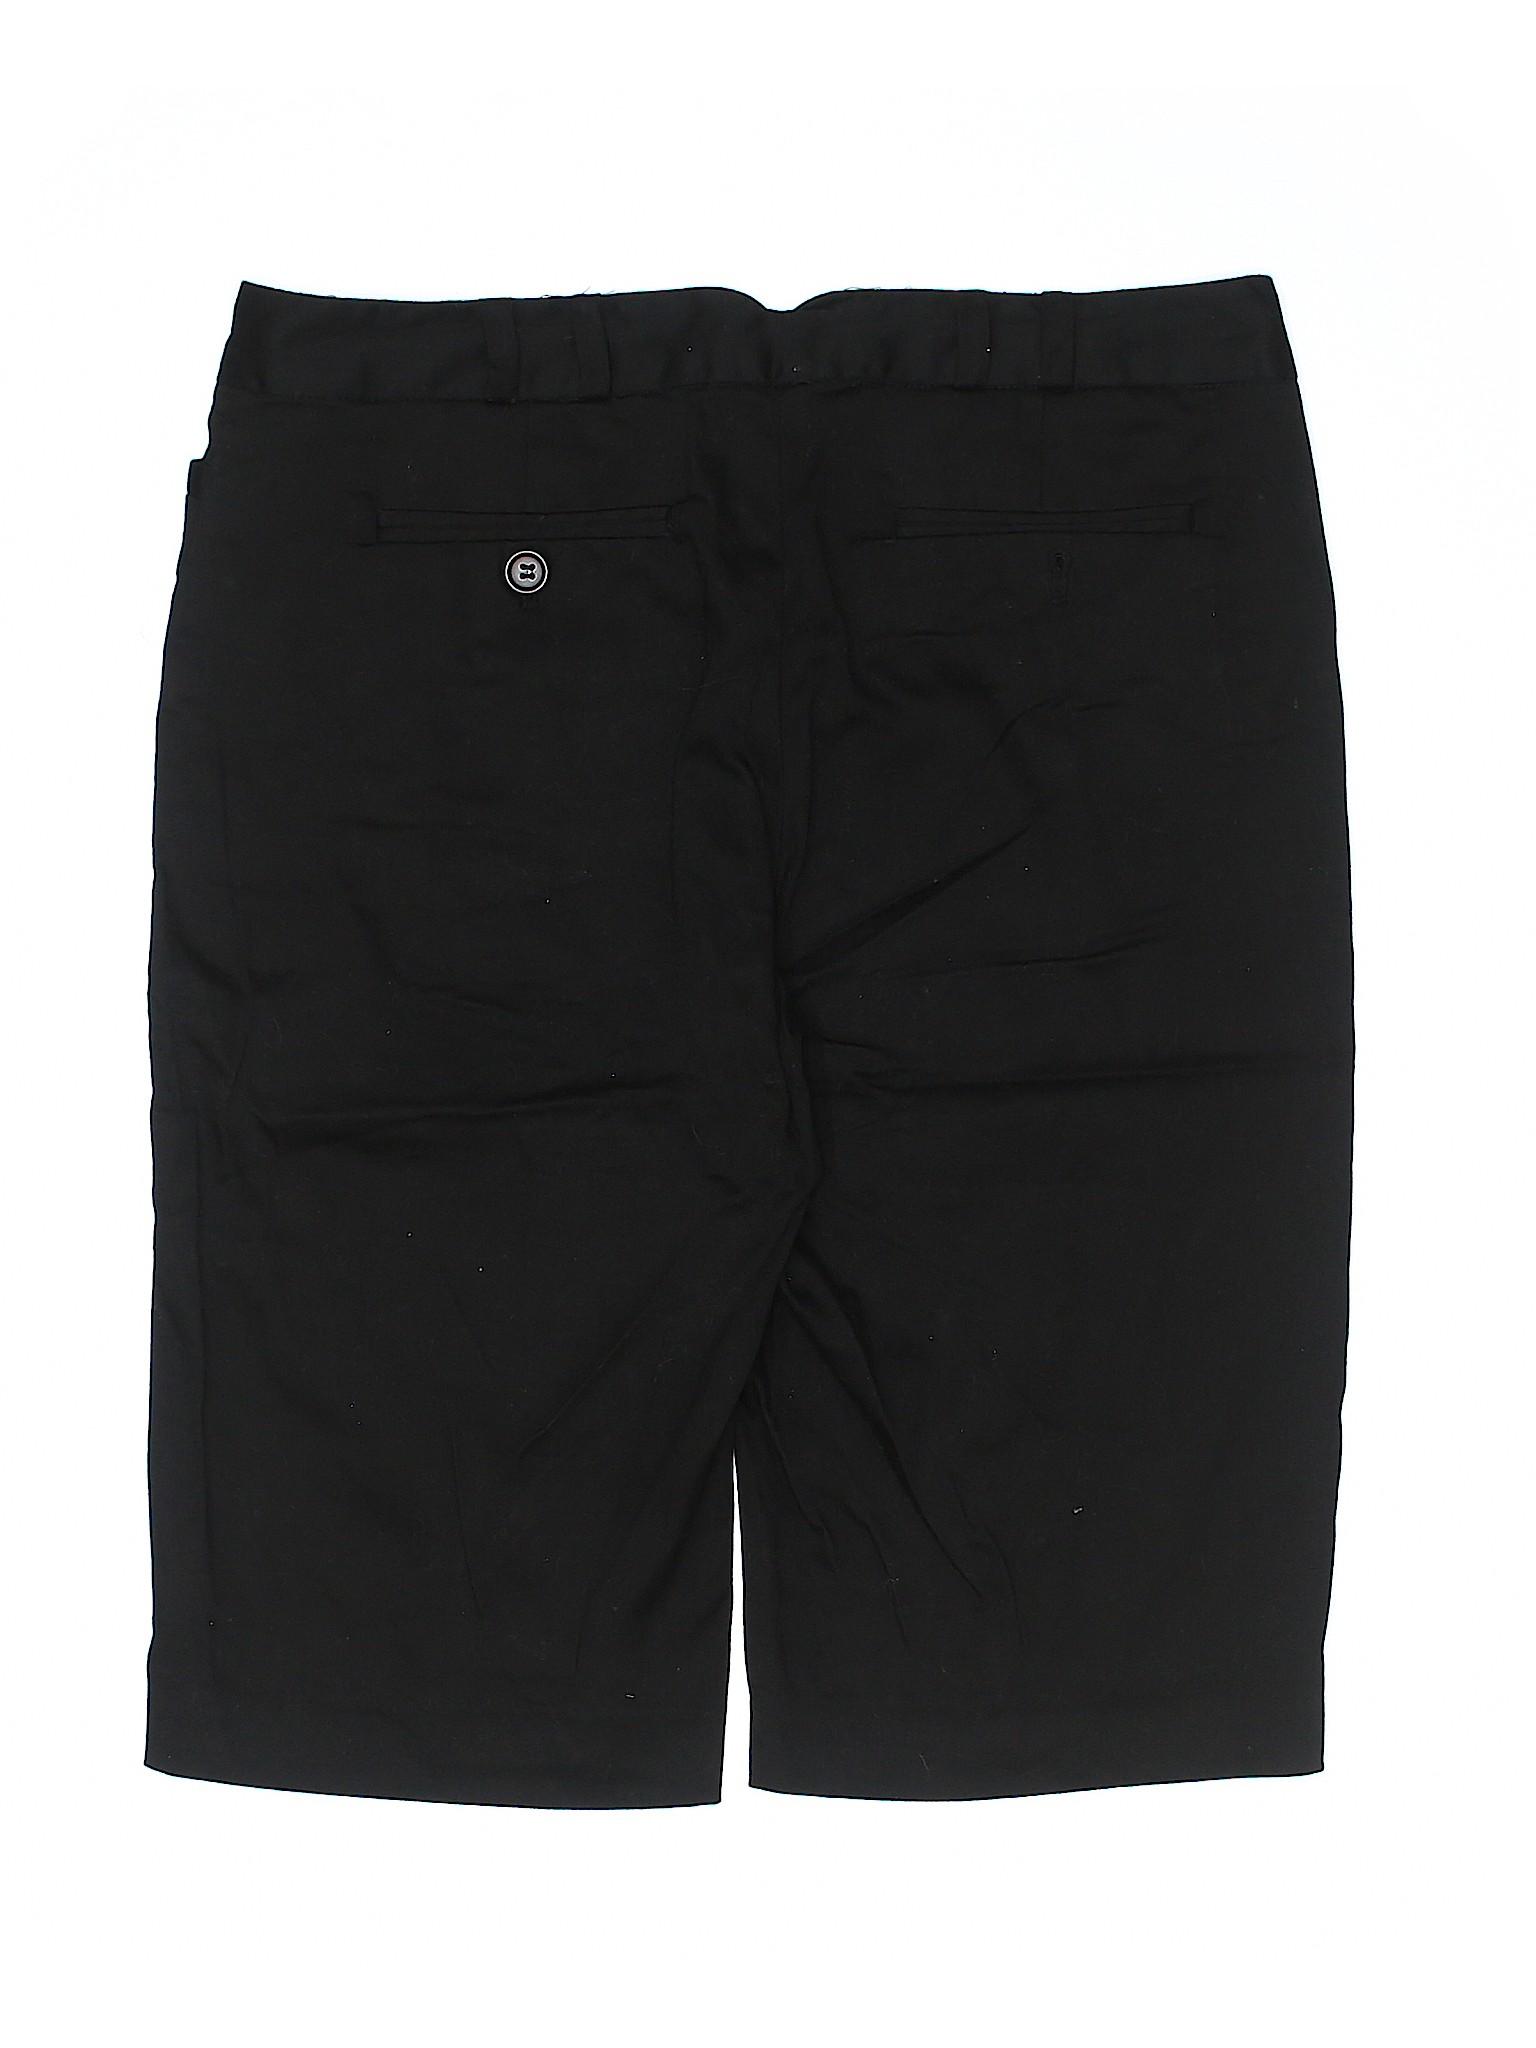 Shorts leisure Boutique The Khaki Limited SIPaq